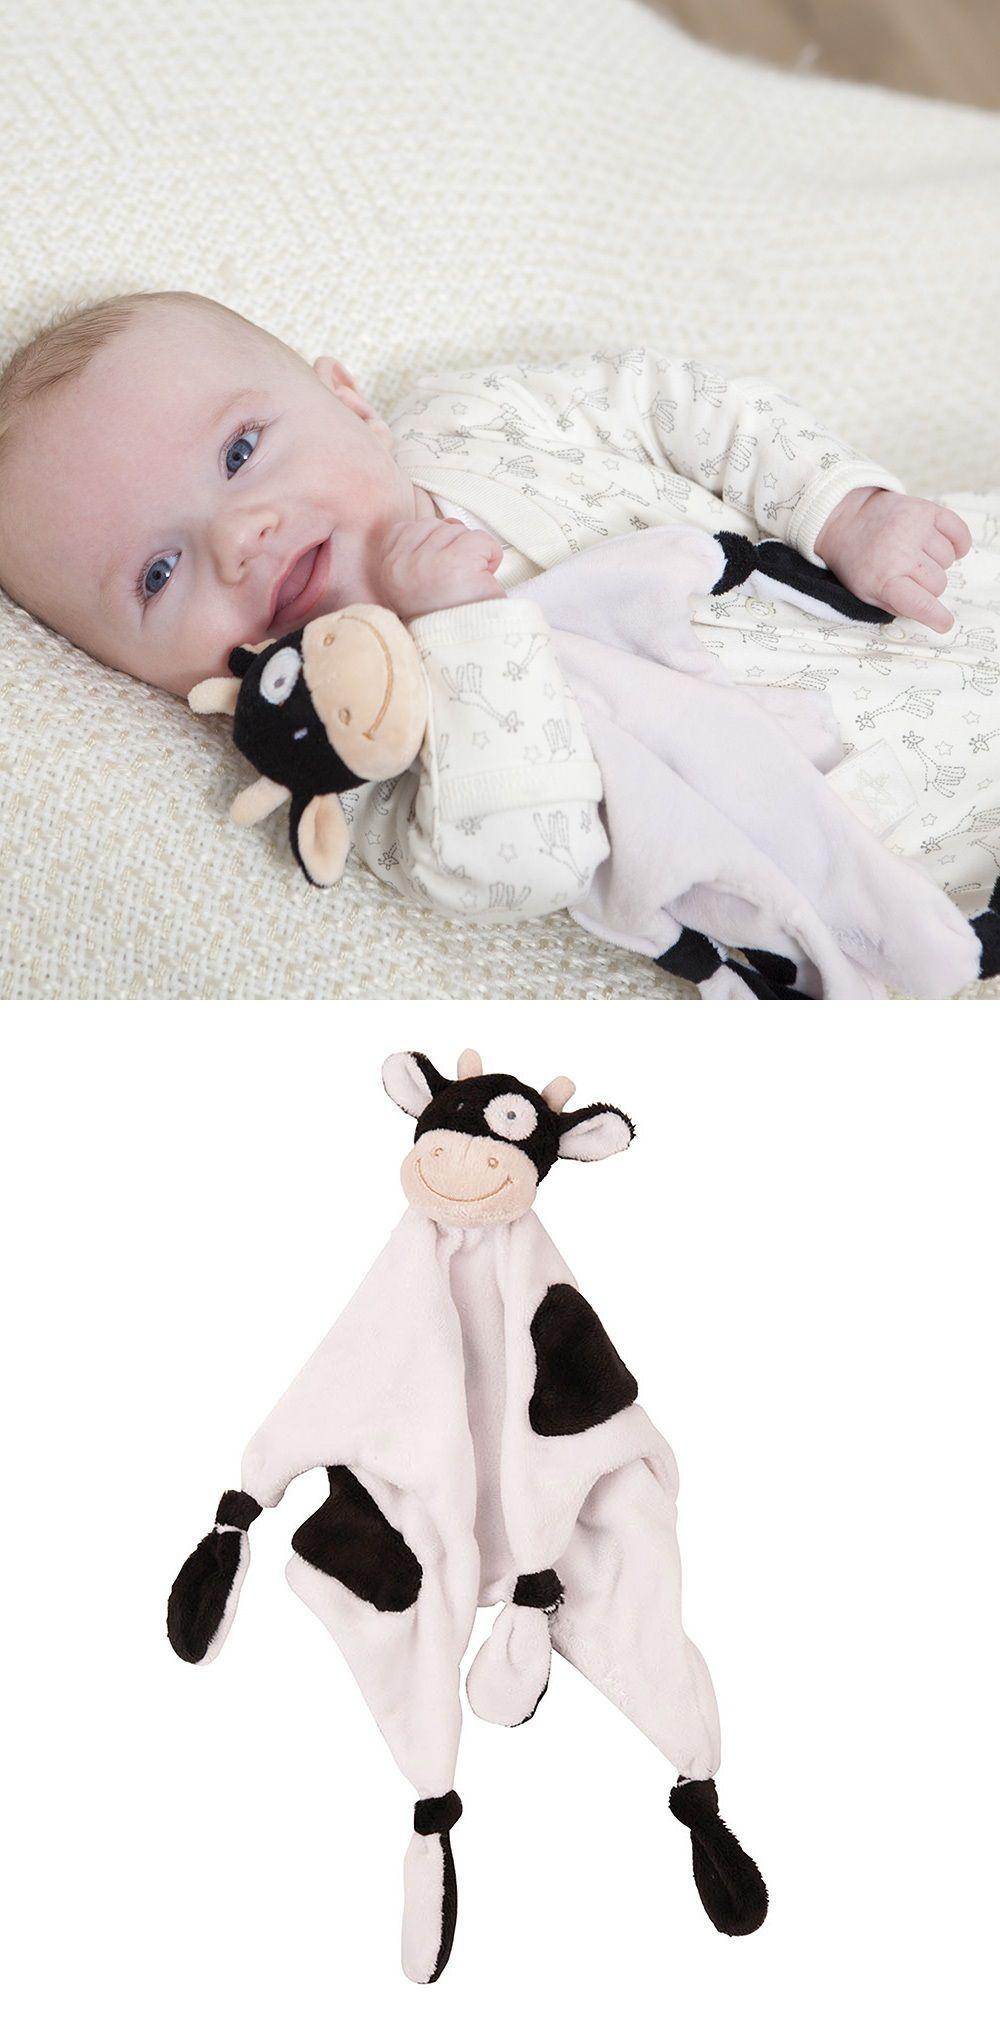 Cow Comforter Baby Comforter Baby Stuffed Animals Quilted Baby